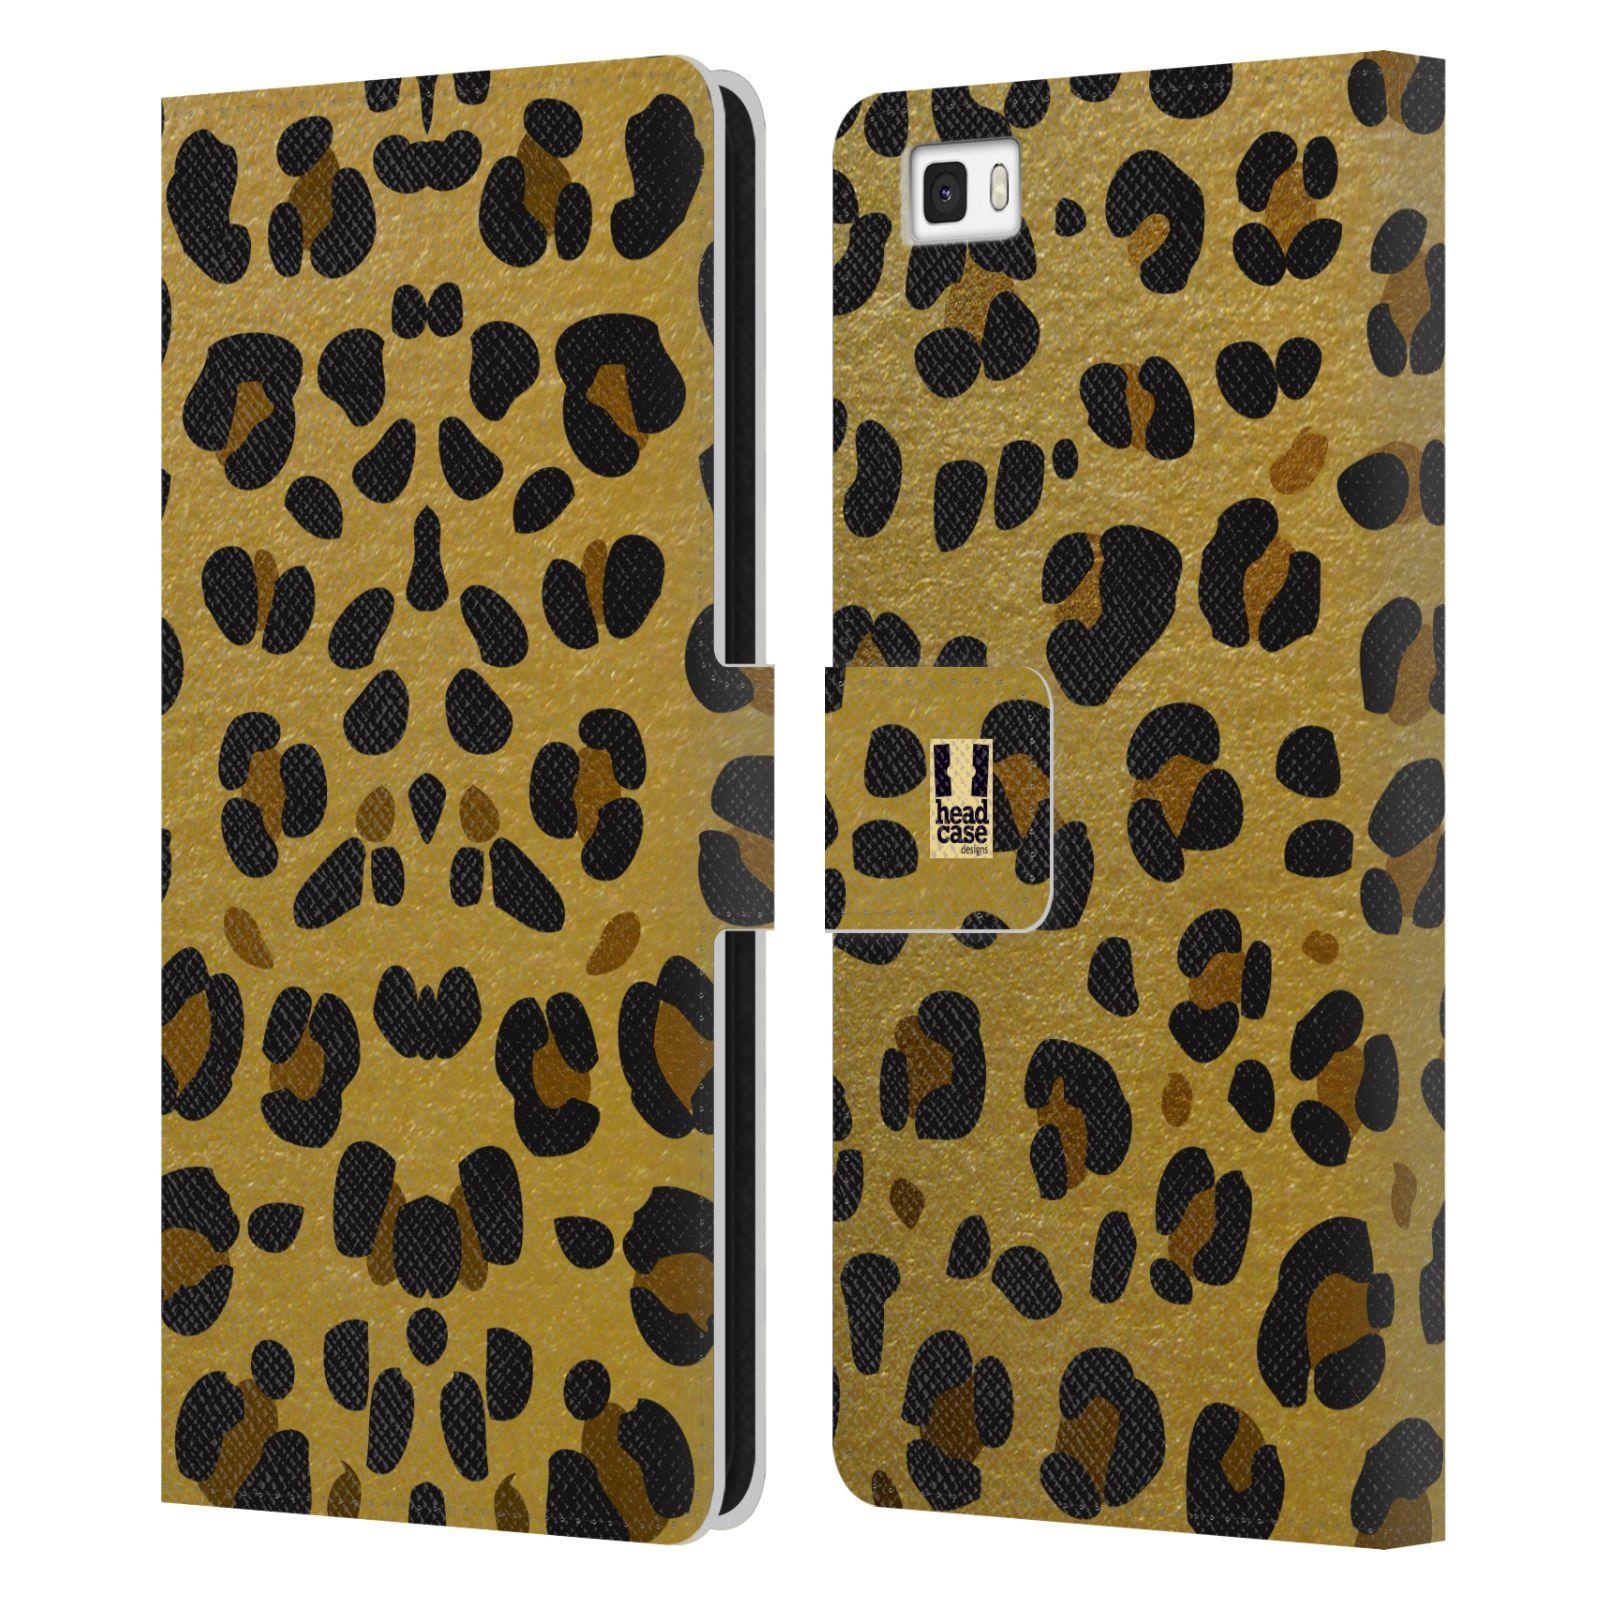 Pouzdro na mobil Huawei P8 Lite - Head Case - Fashion zvířecí vzor